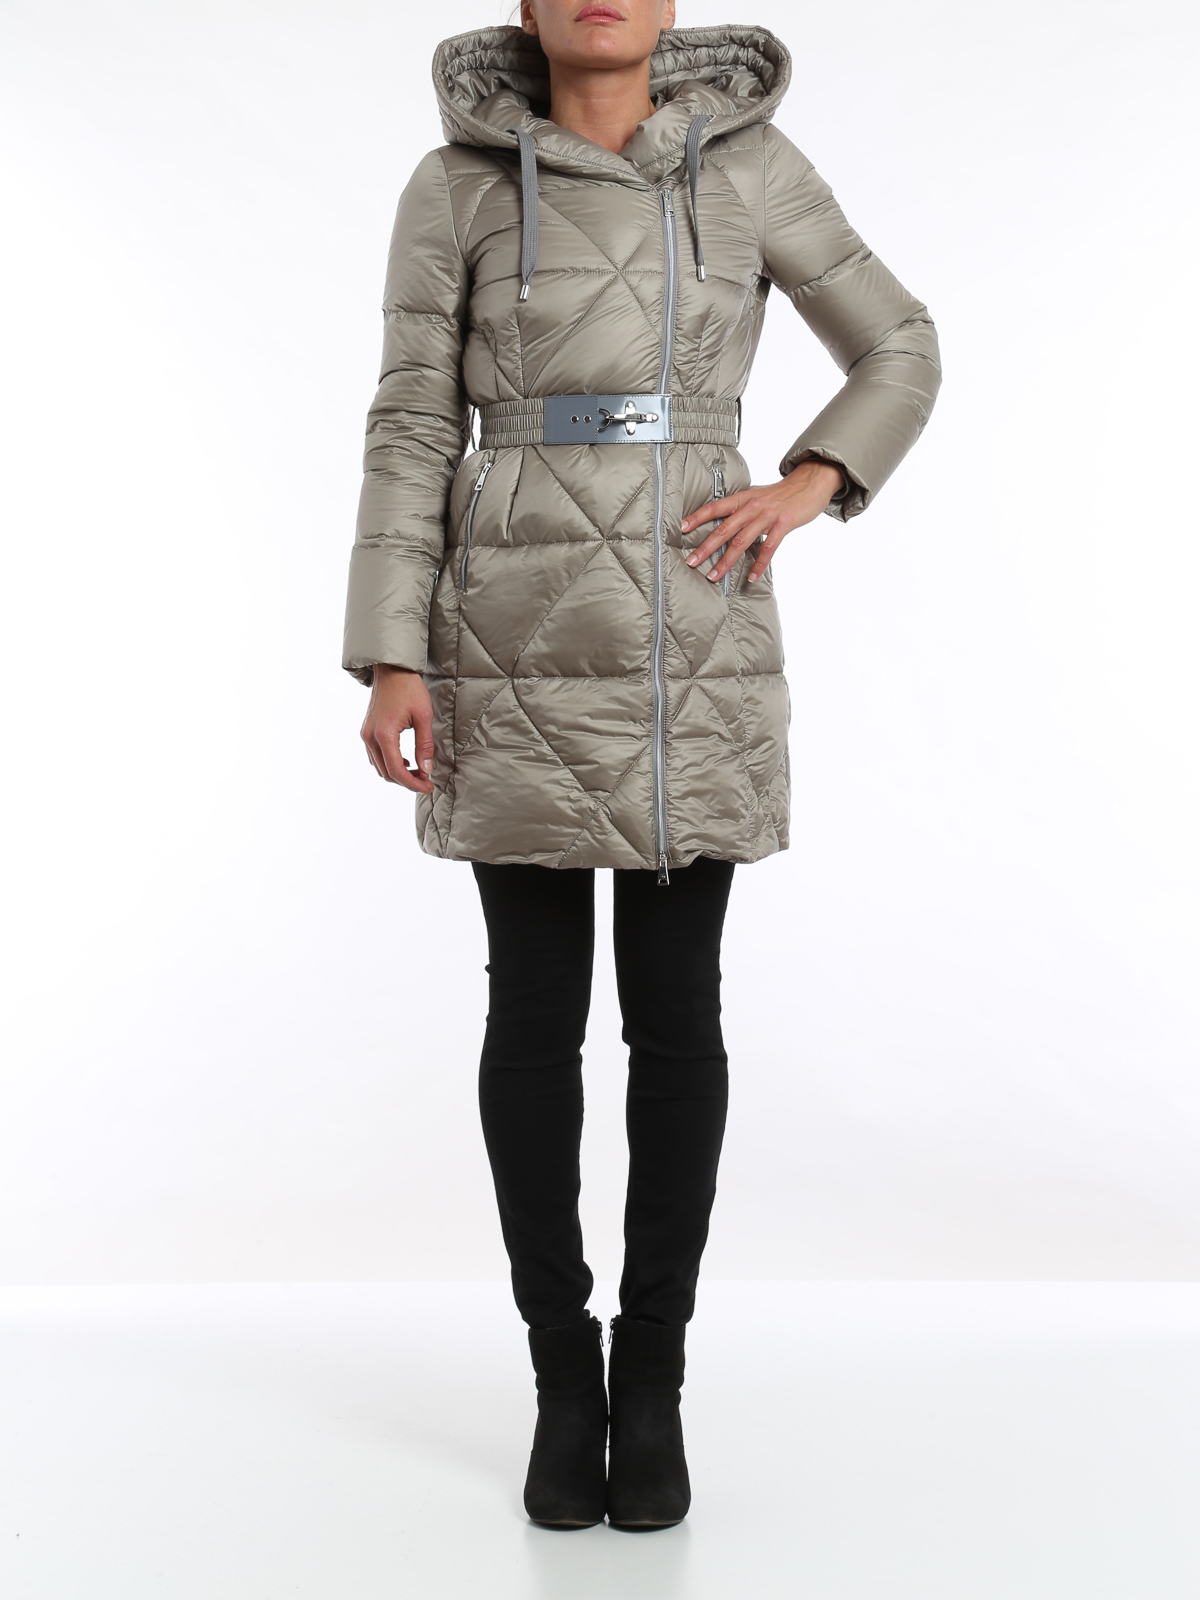 new styles 25120 2f3ea Fay - Piumino con cintura - giacche imbottite - NAW3331432 ...